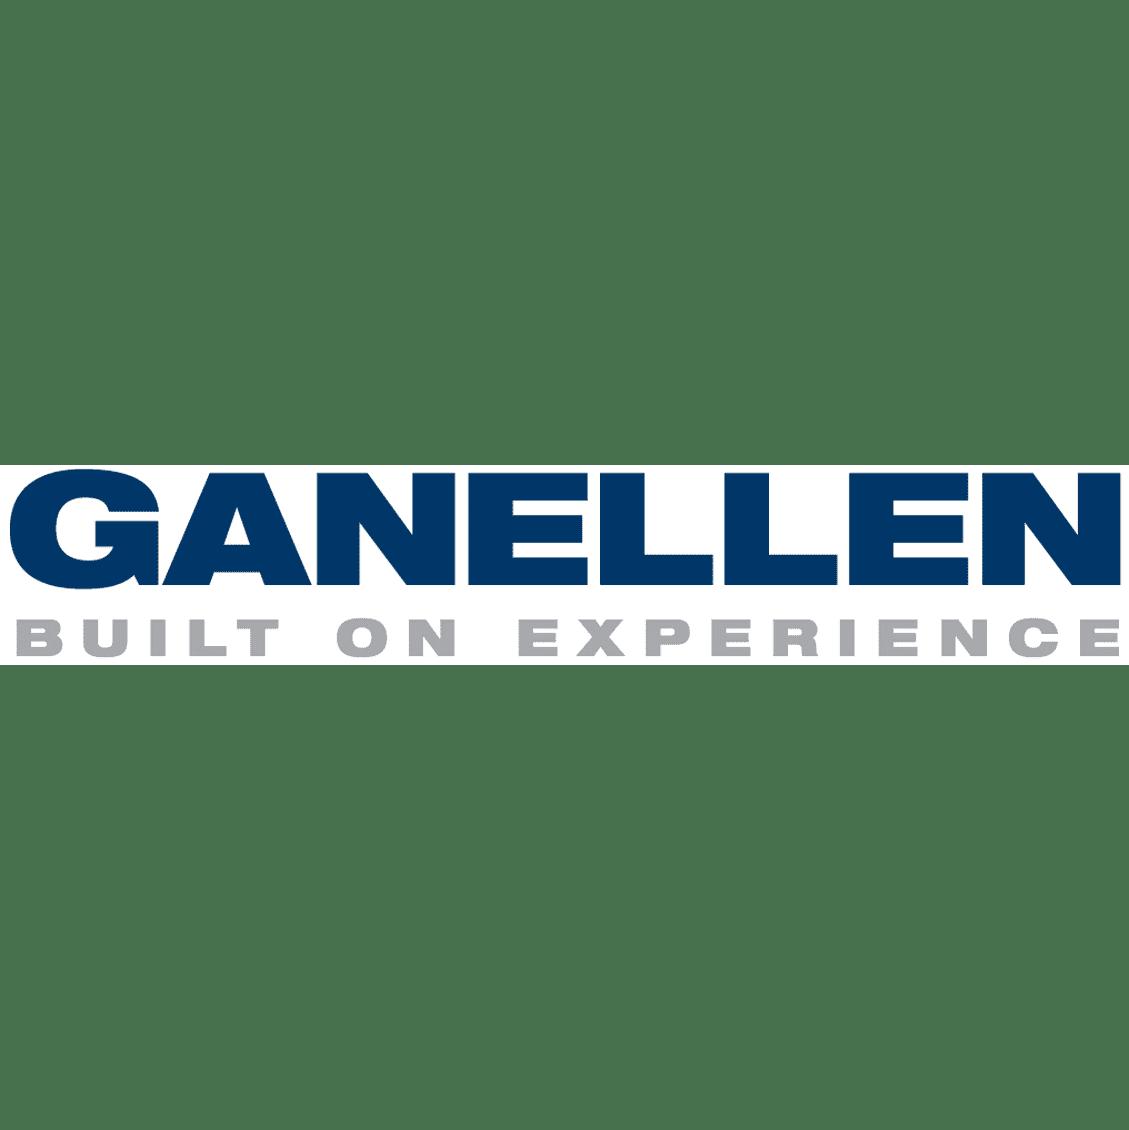 GANELLEN